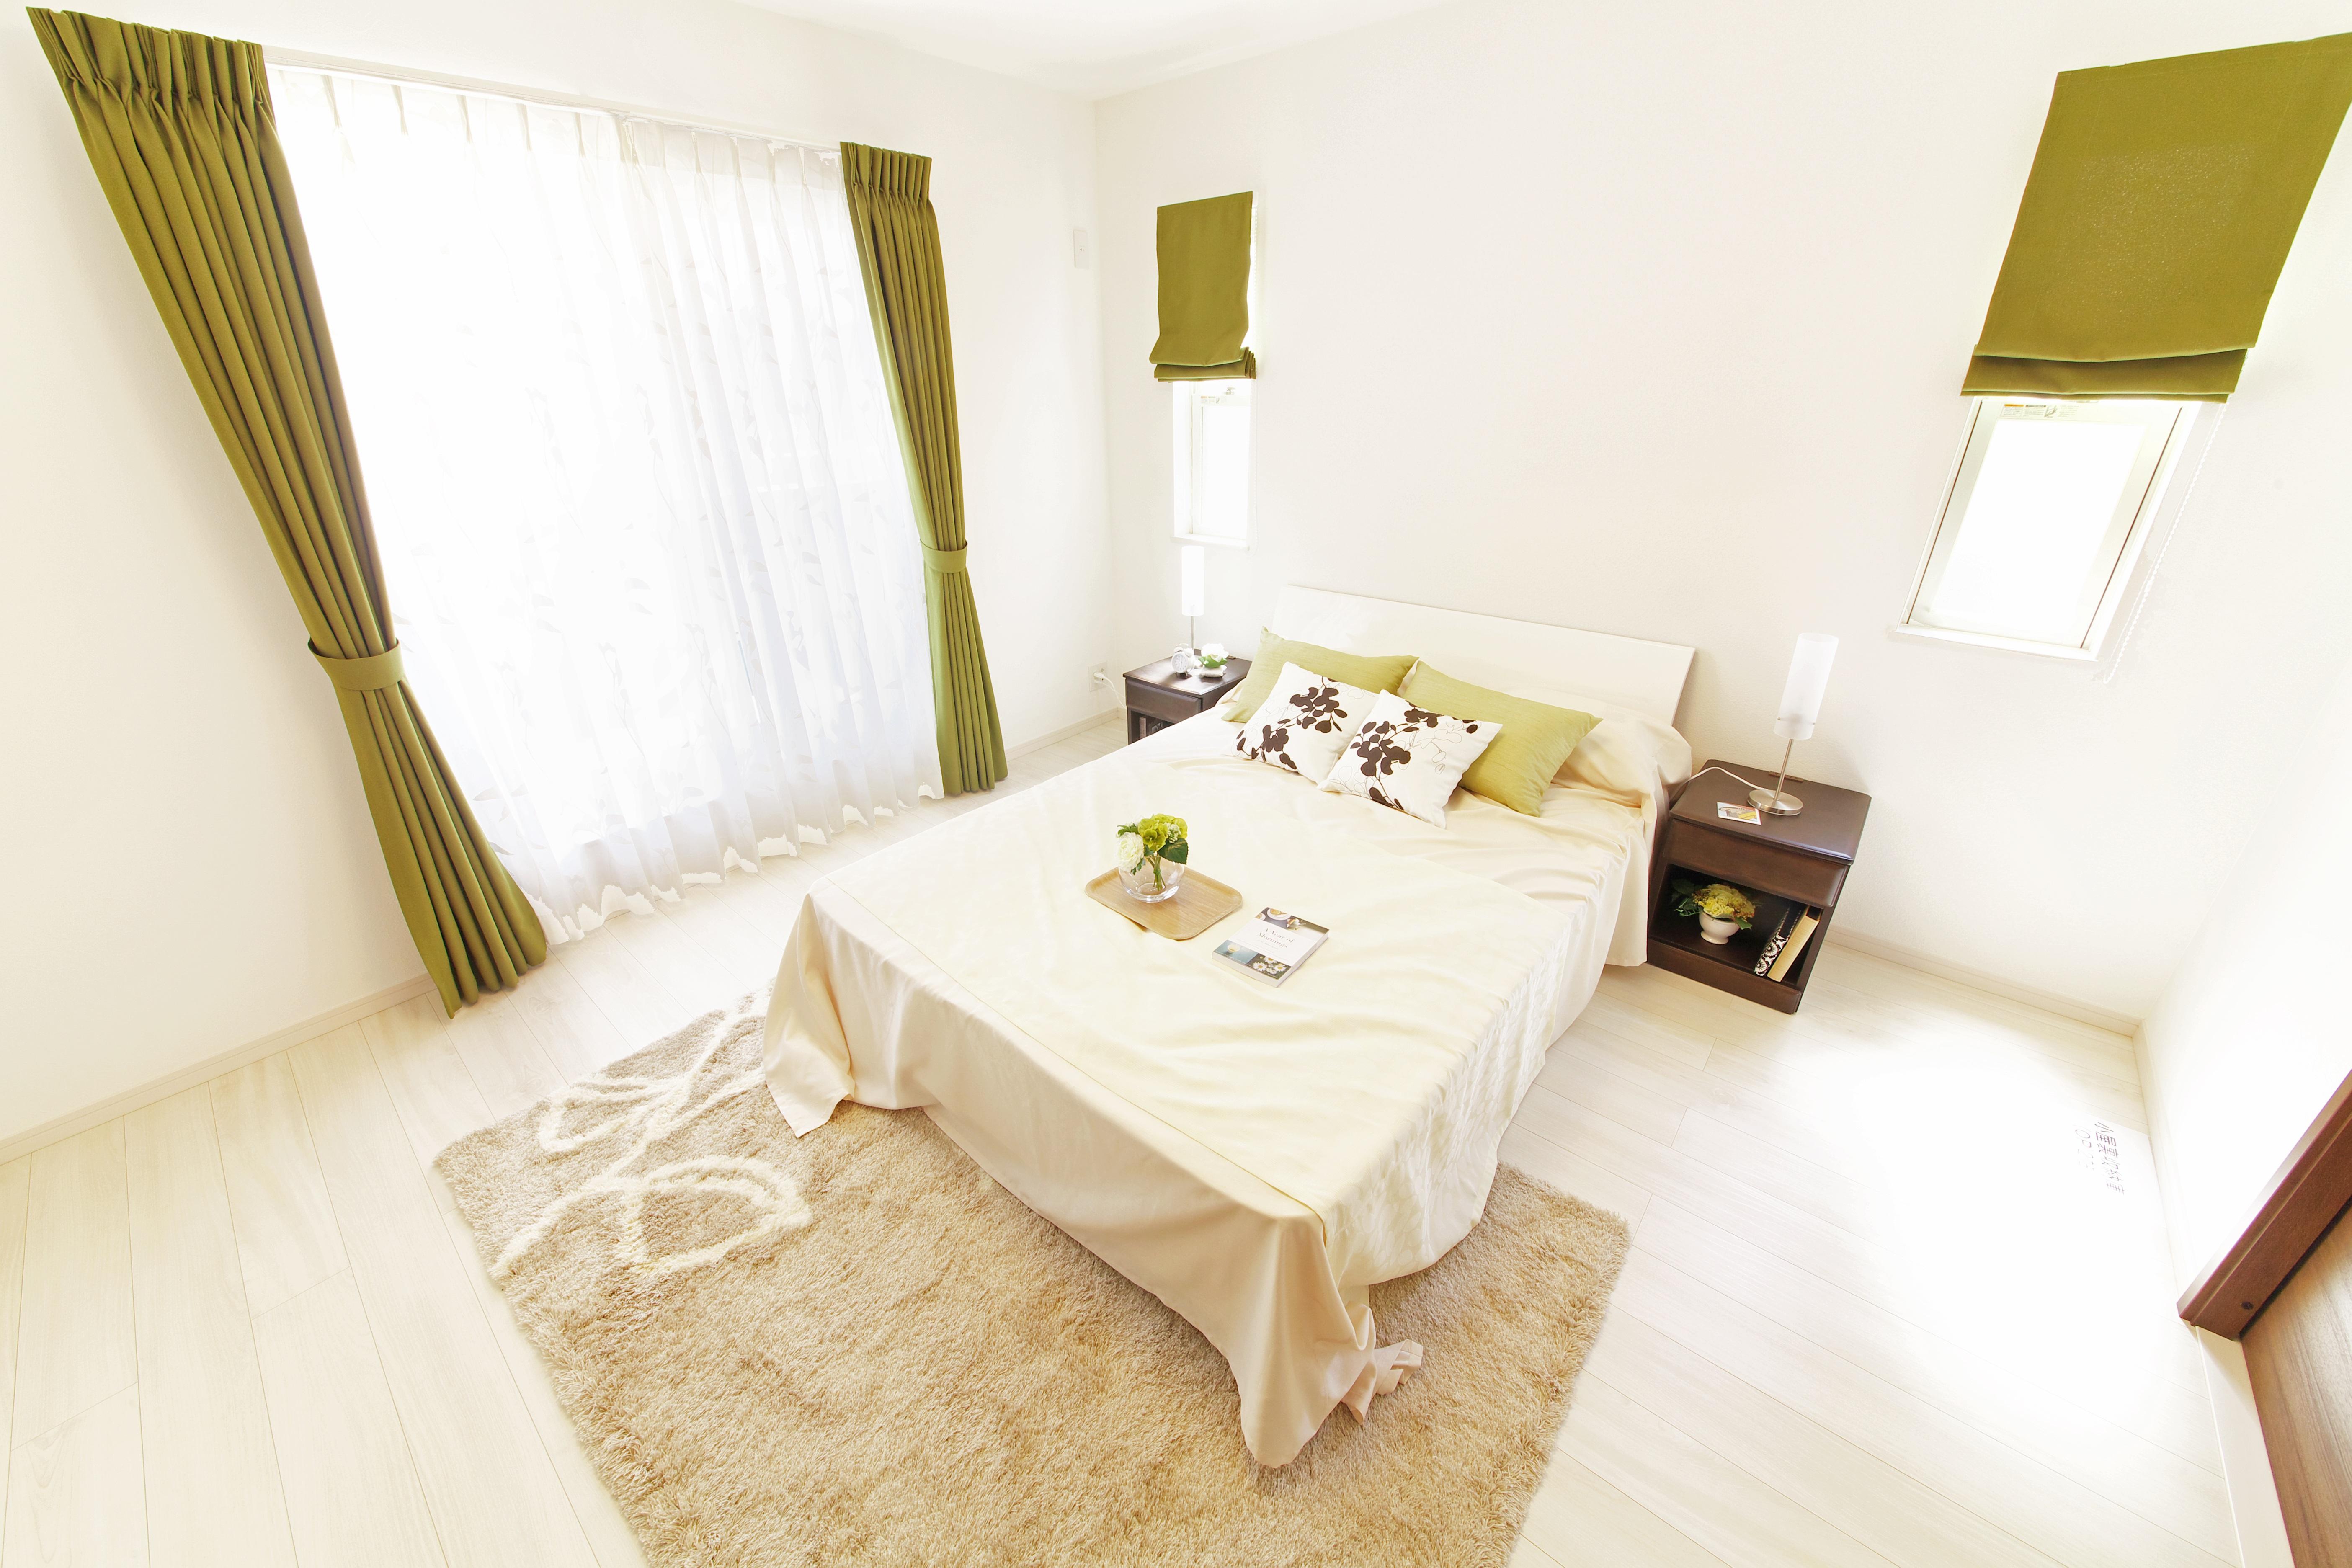 Home Cottage Property Room Bedroom Apartment Housing Interior Design Suite  Real Estate Completion